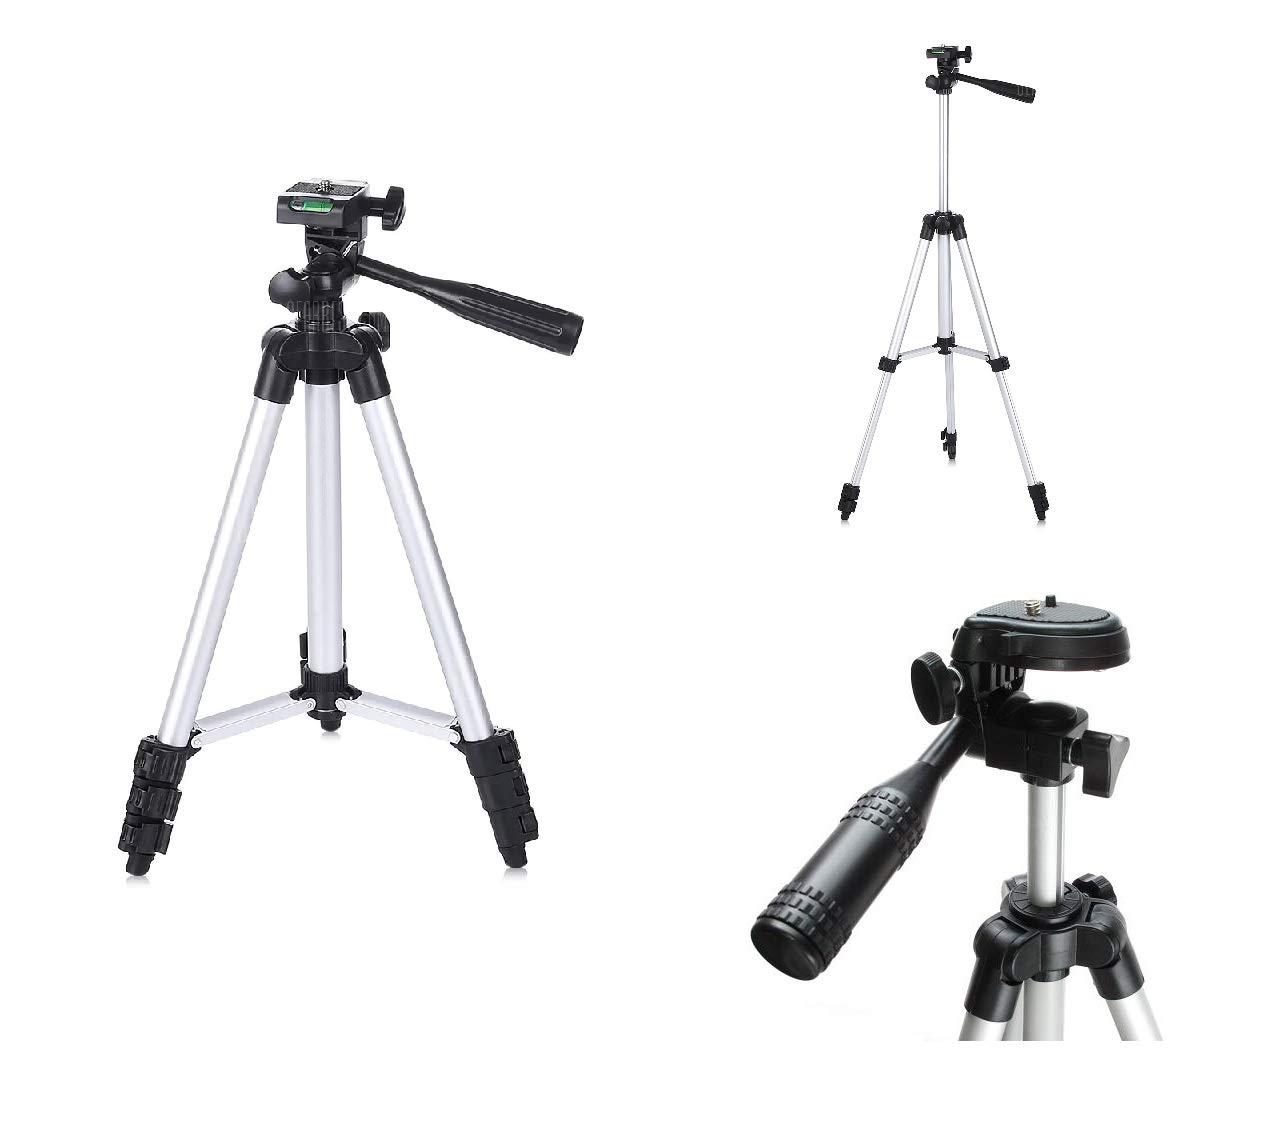 S3700 S32 L30 S7000 S9700 S33,S3100 L31 Pluvios Lightweight Digital Camera Tripod S**** Series inc A10 S9500 Tripod Carry Bag for Nikon Coolpix AW AW130 J4 L2* S6300 J5 S3500 S6700